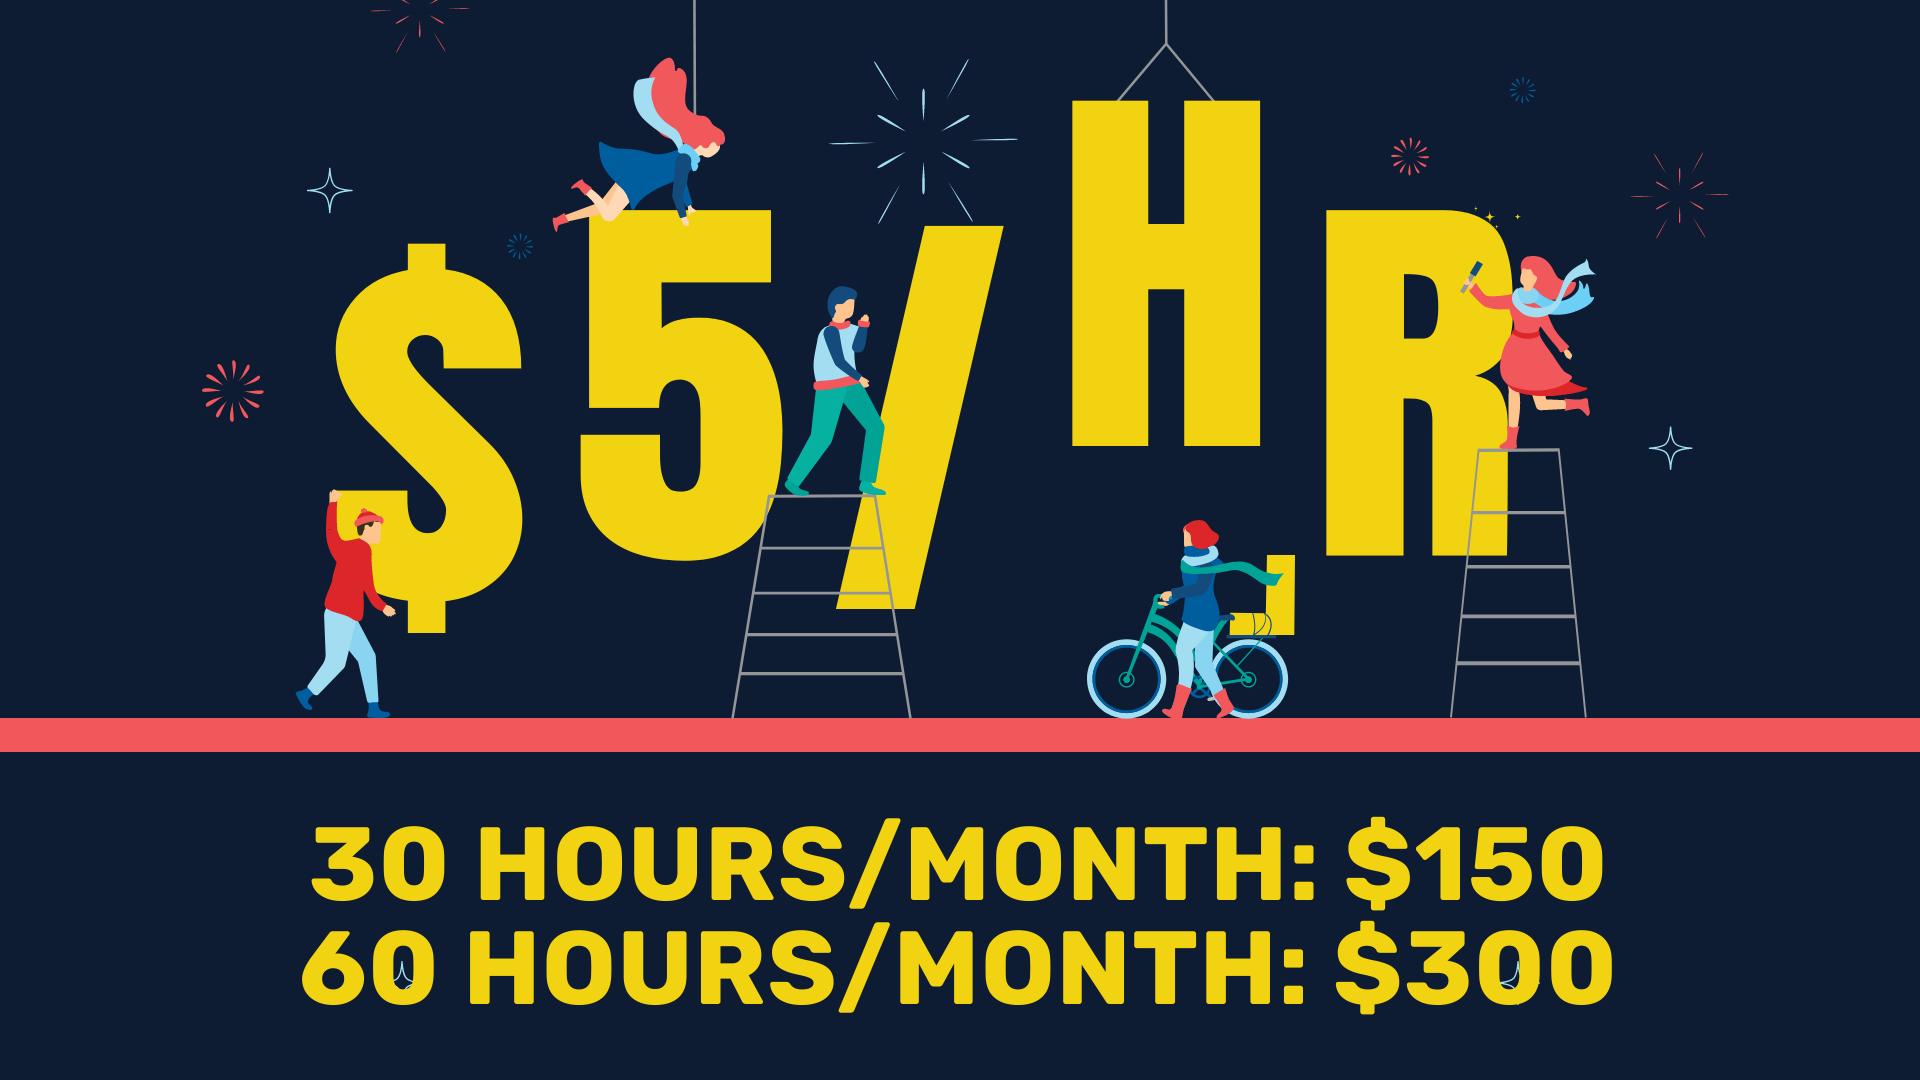 Portland Dance Studio 5 dollars per hour special